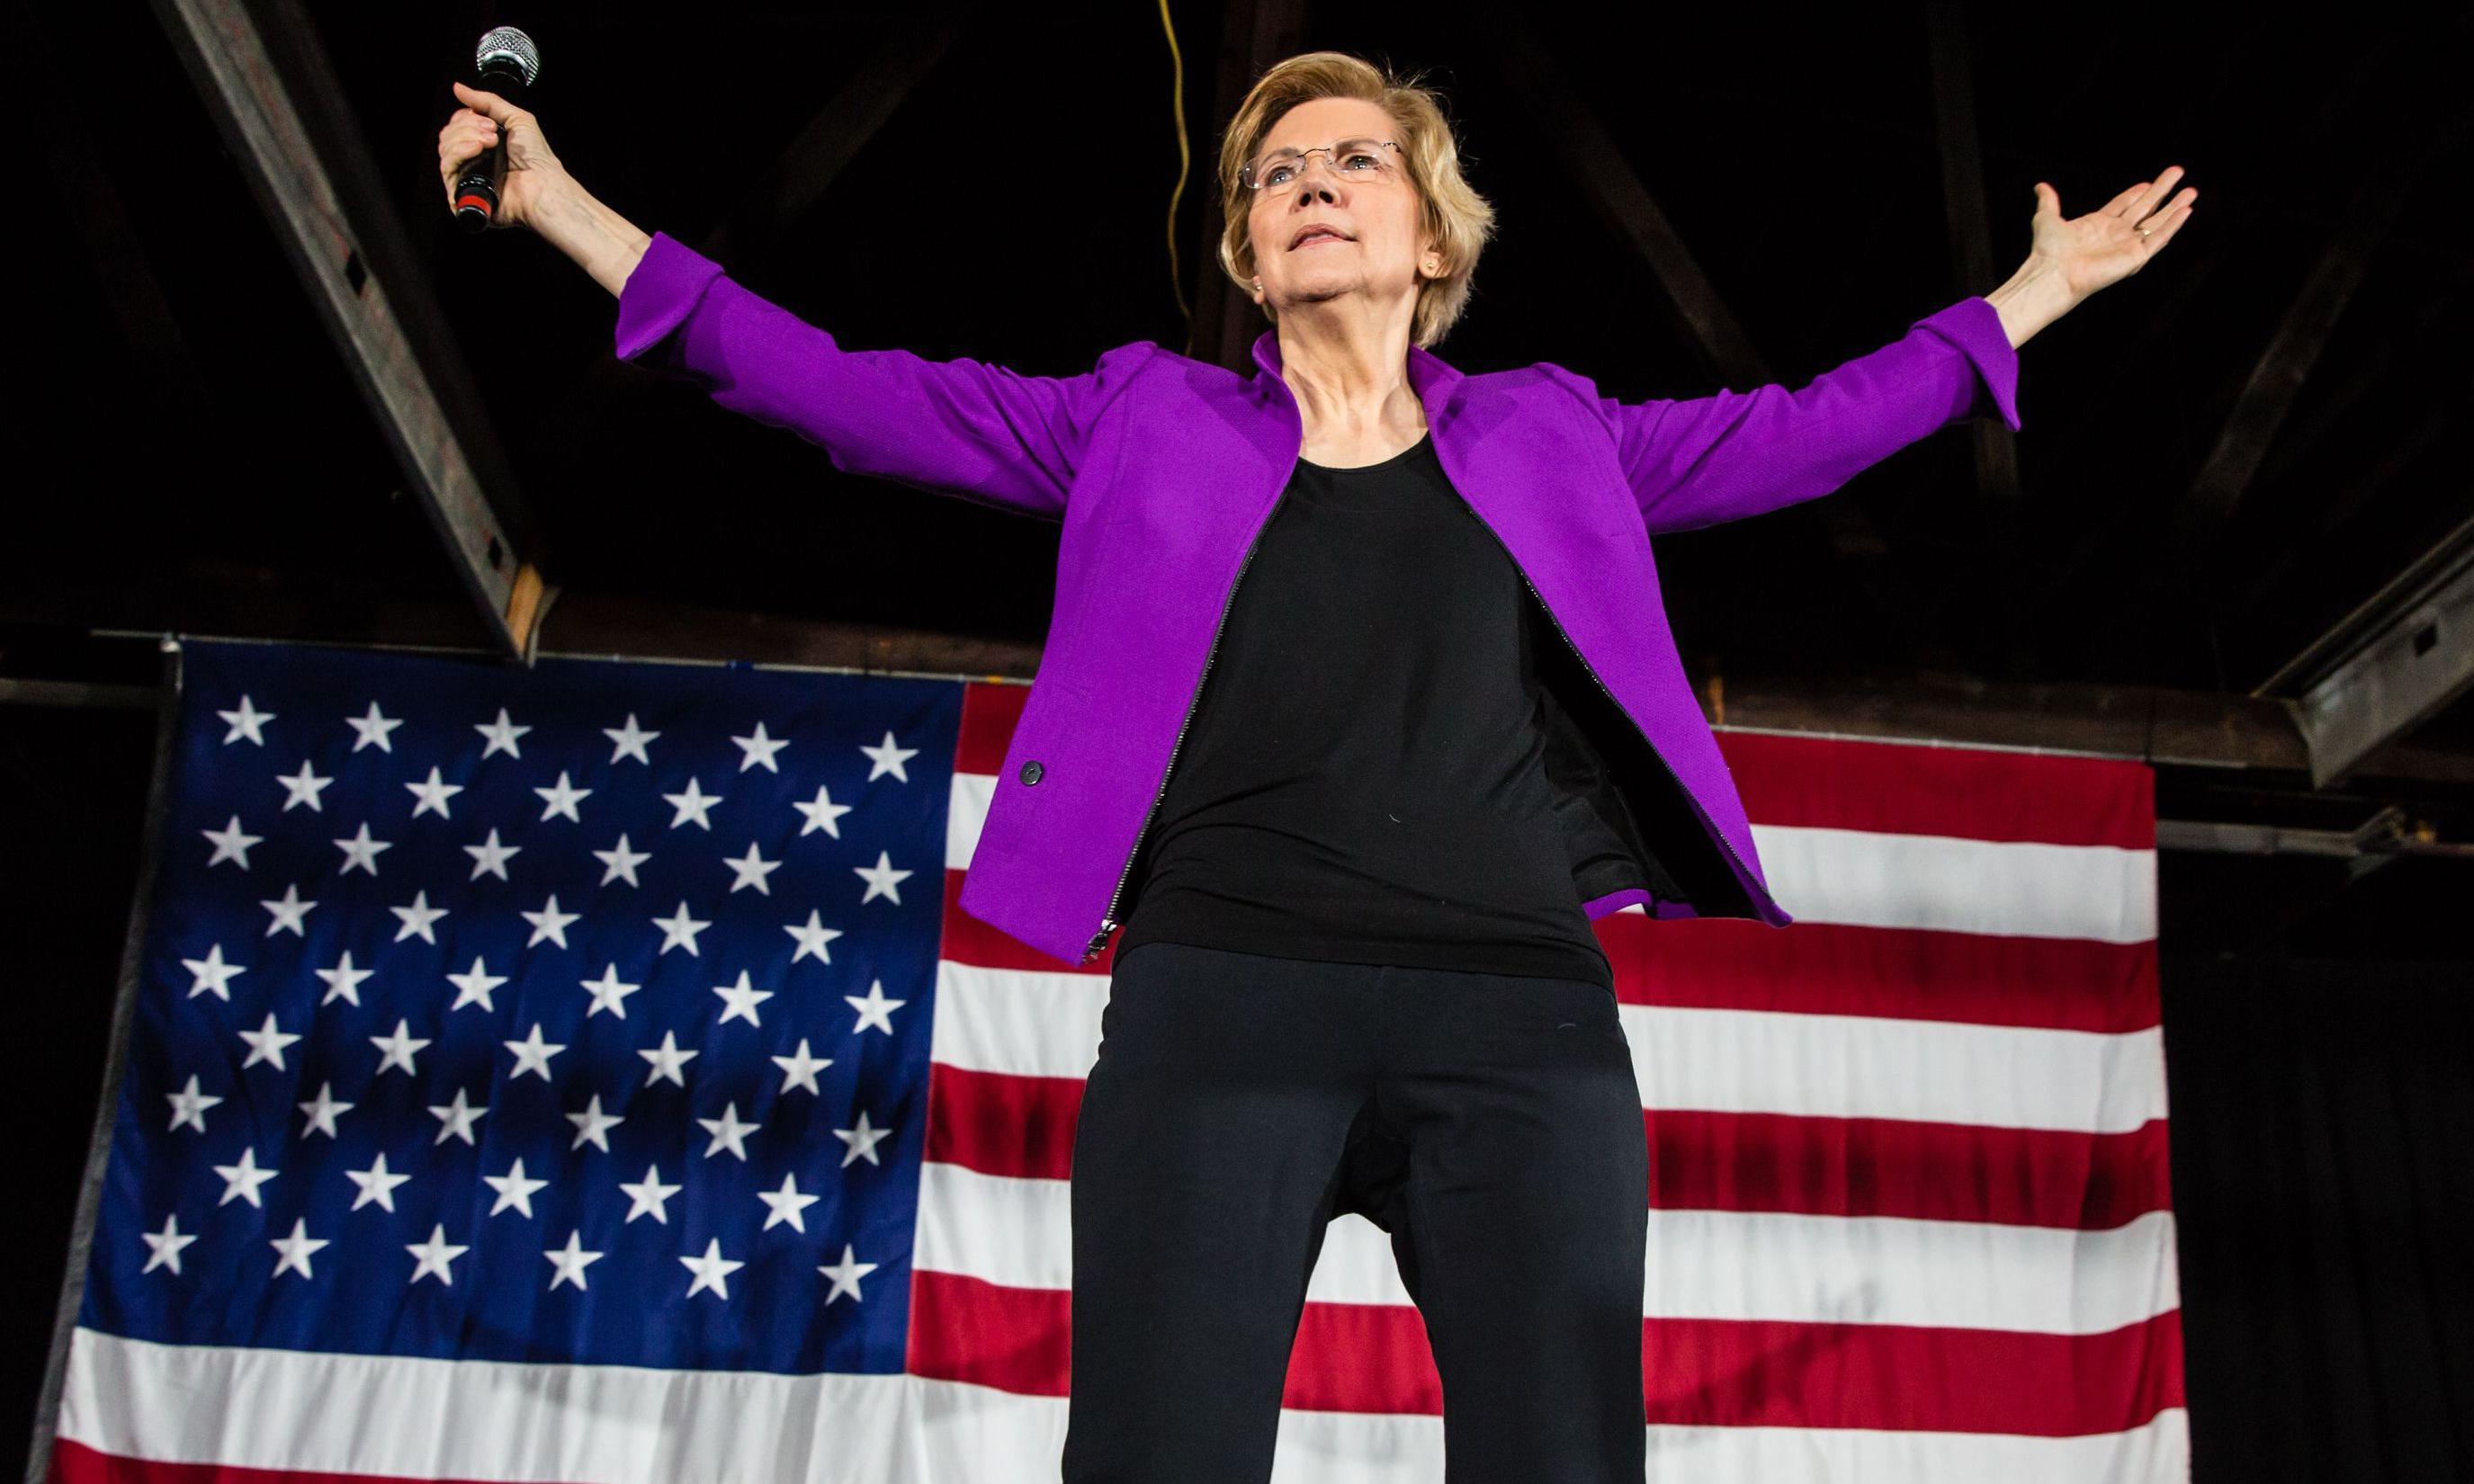 Elizabeth Warren is the intellectual powerhouse of the Democratic party